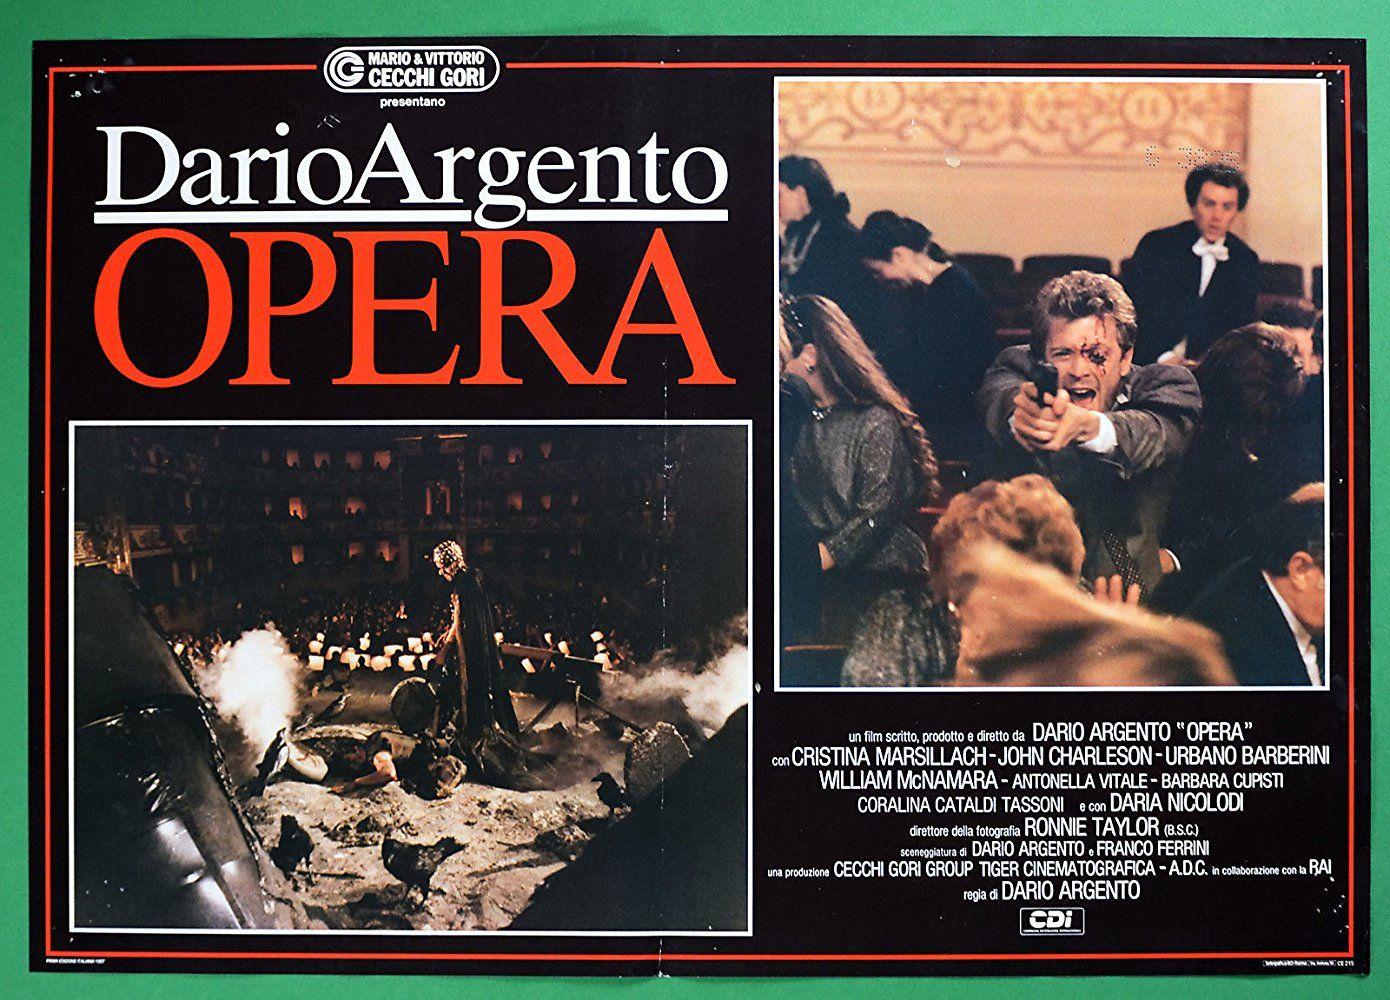 Opera 1987 Dario Argento Cristina Marsillach-MOVIE POSTER CINEMA FILM ART